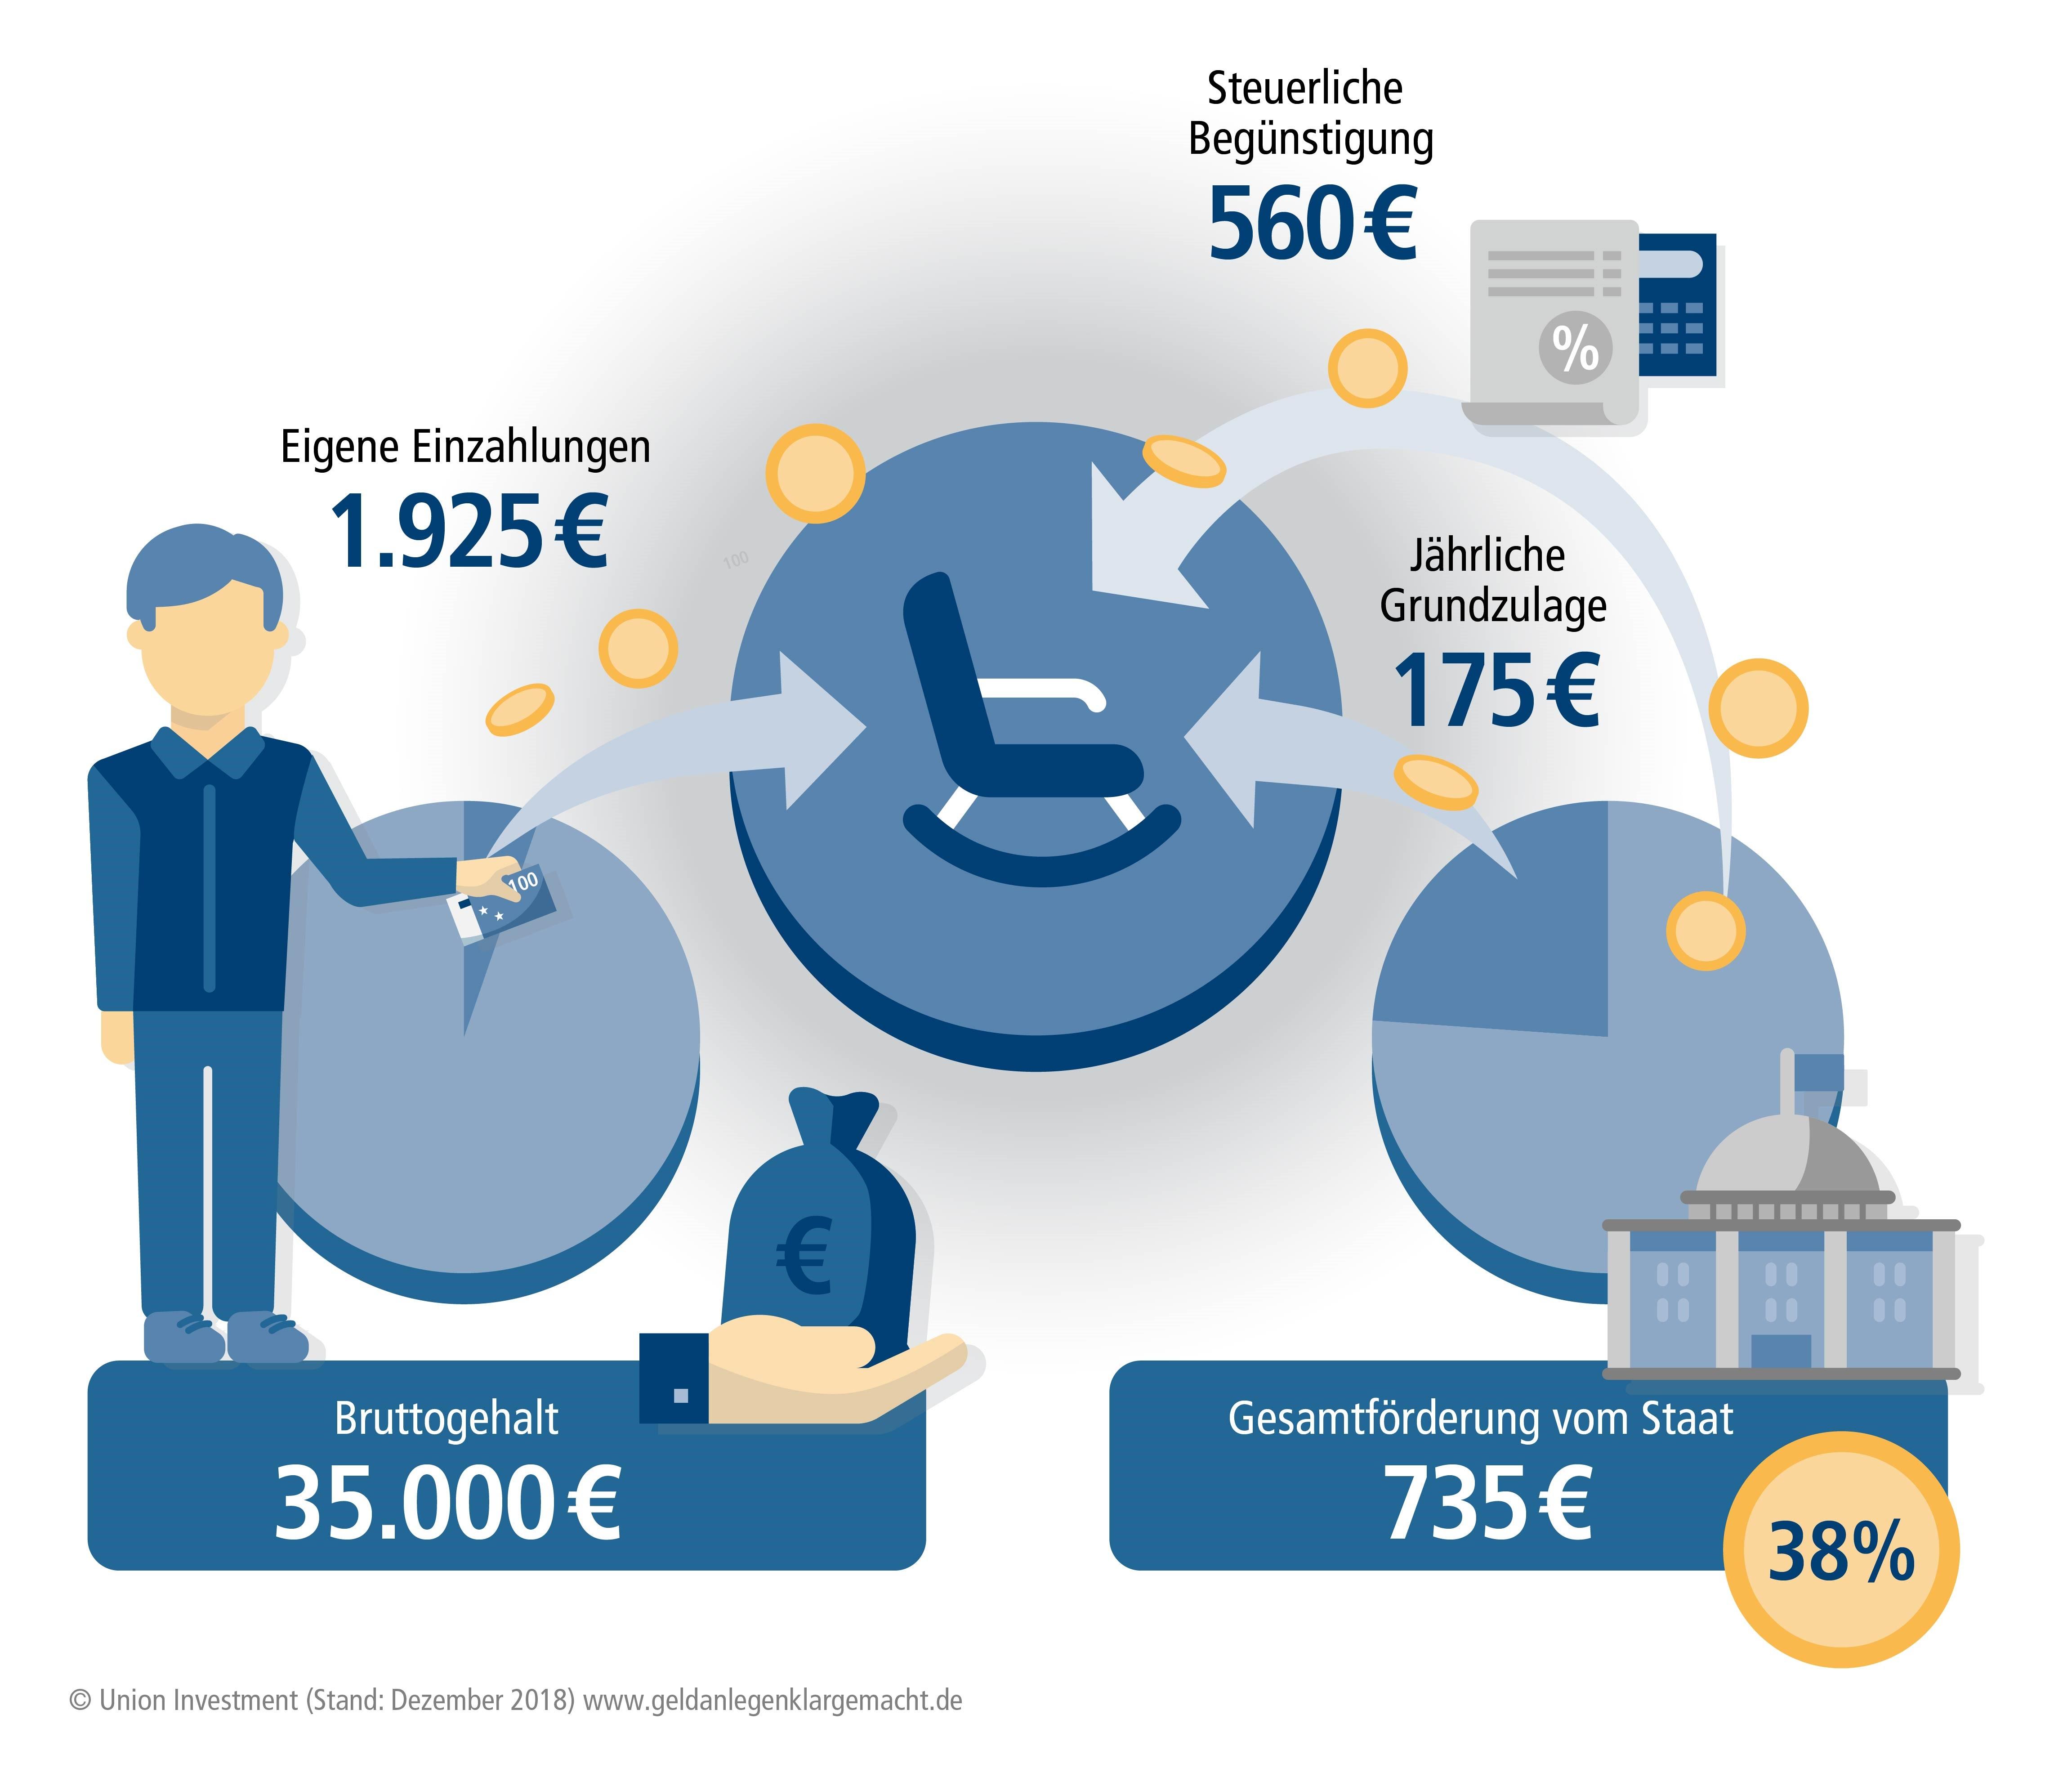 Union investment riester kinderzulage zh forex trader slovenija